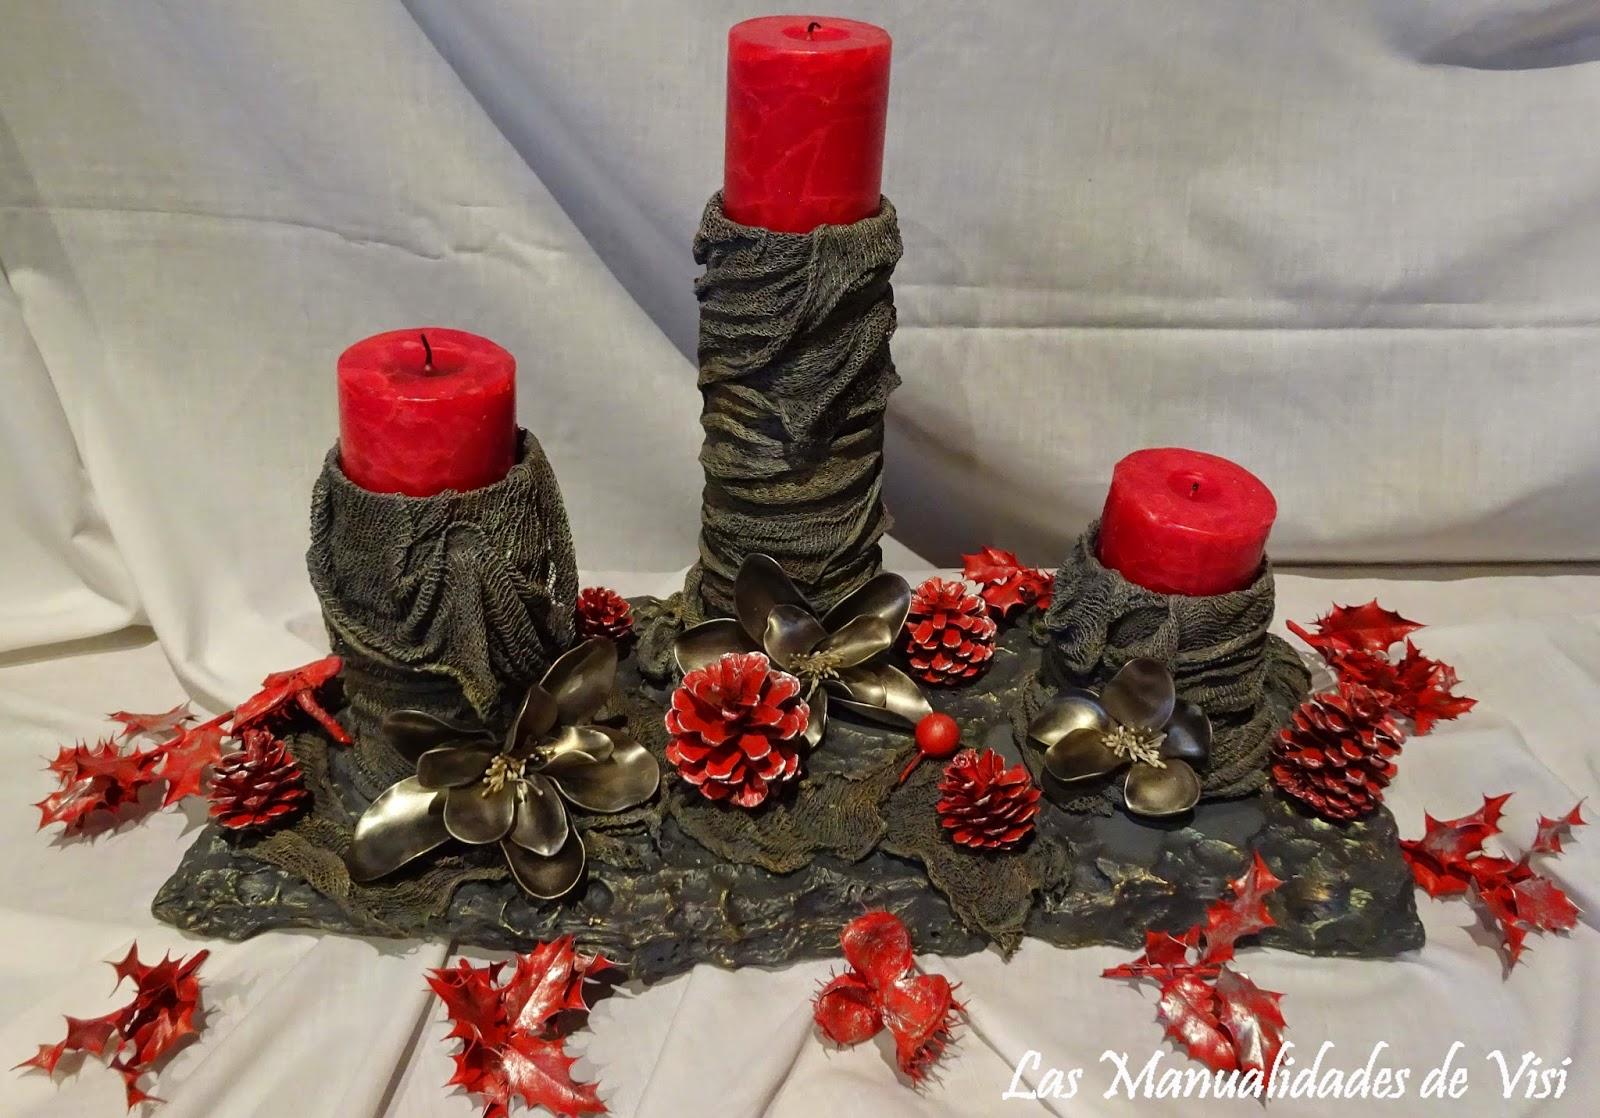 Las manualidades de visi centro de mesa con velas - Manualidades navidad con pinas ...